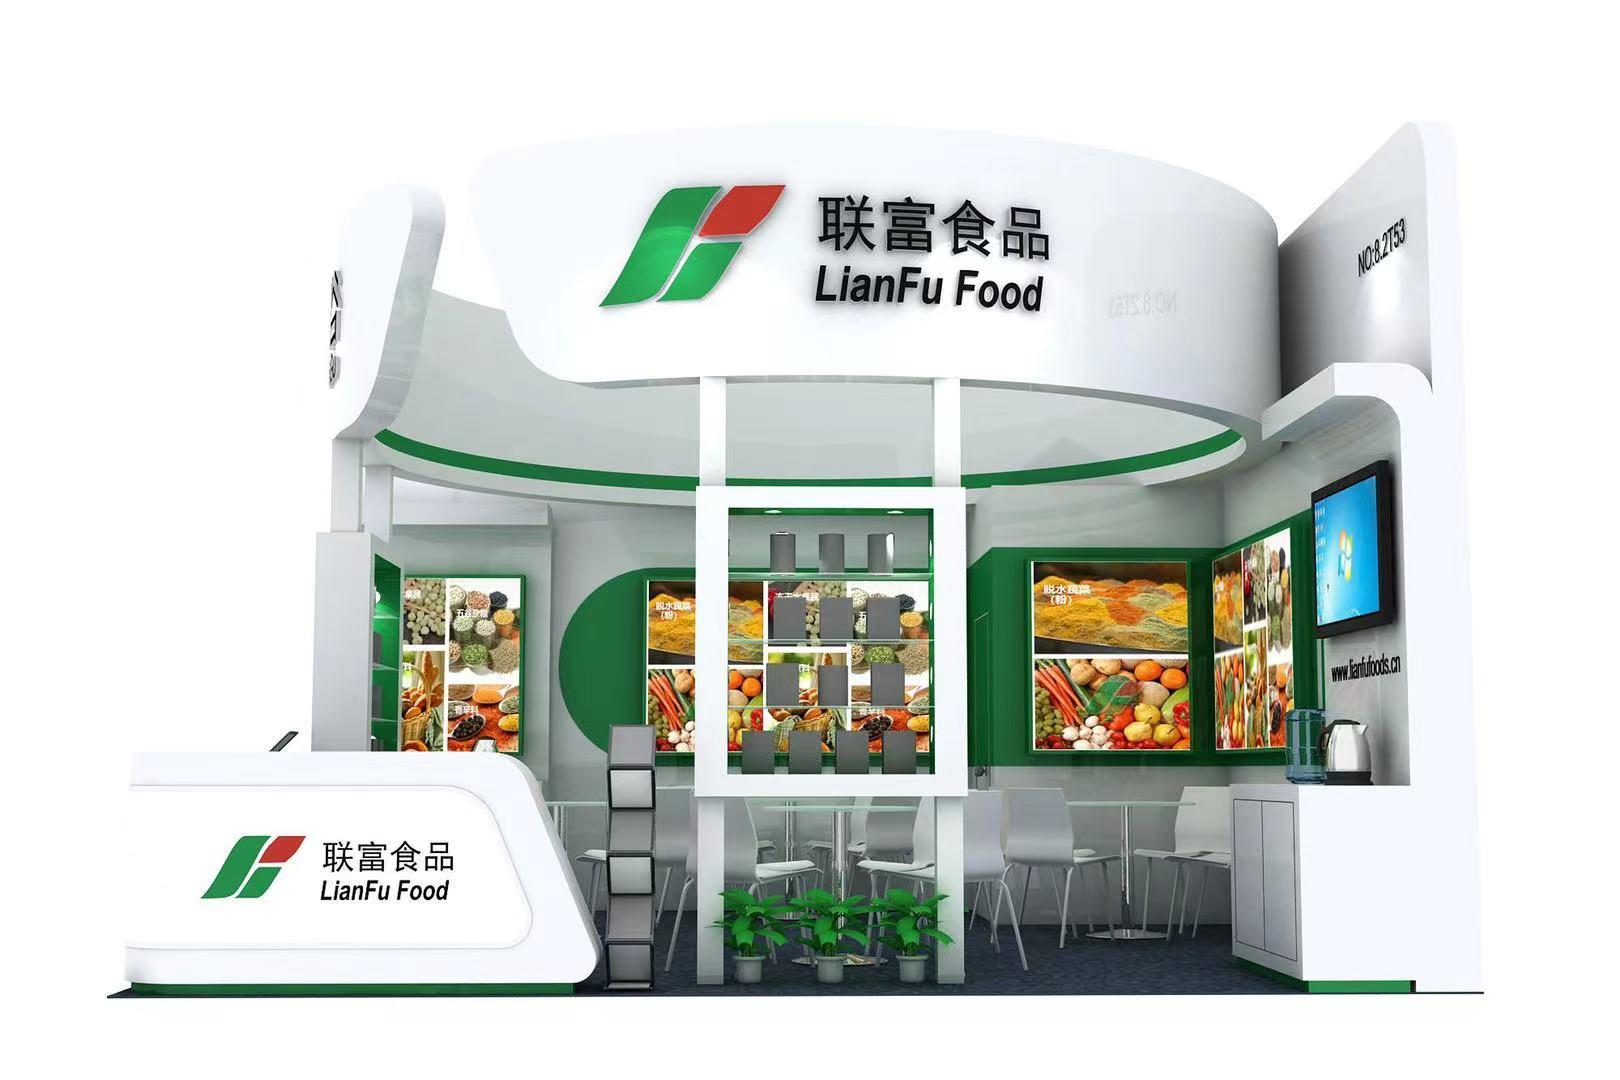 Xinghua Lianfu Food Booth 82T53